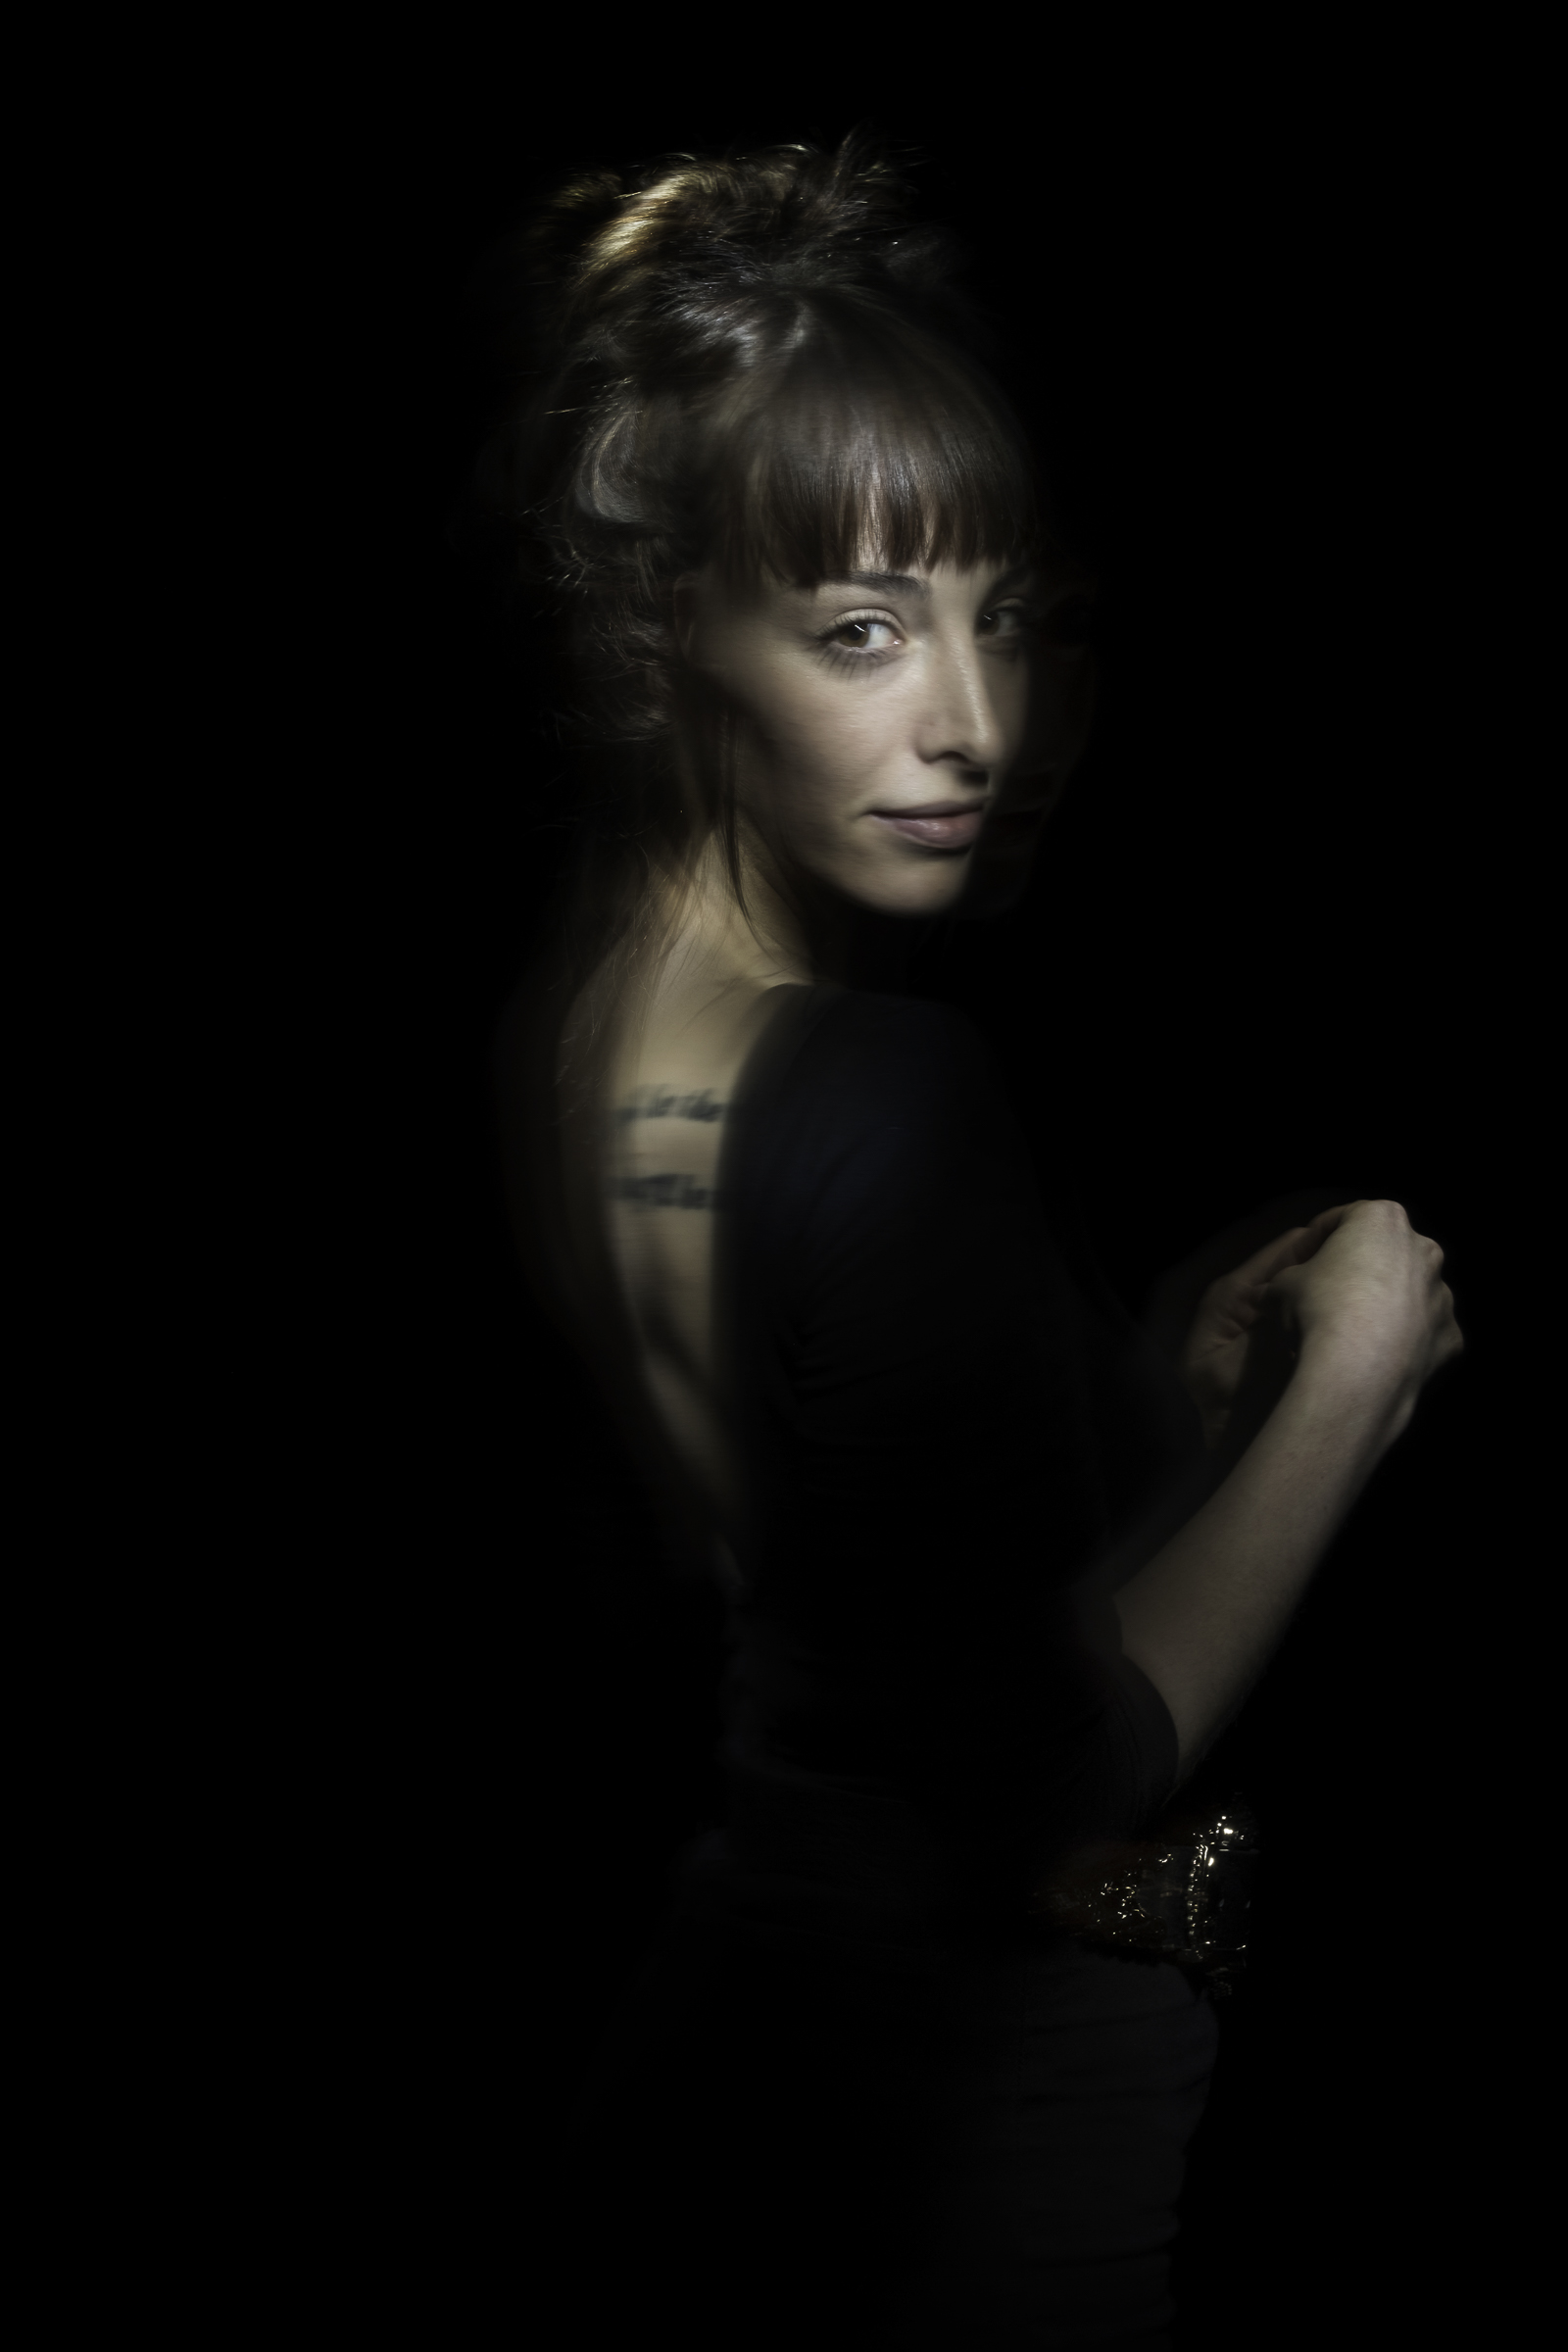 Lightpainting_photography_portraits_by_CatalinAnastase_6.jpg